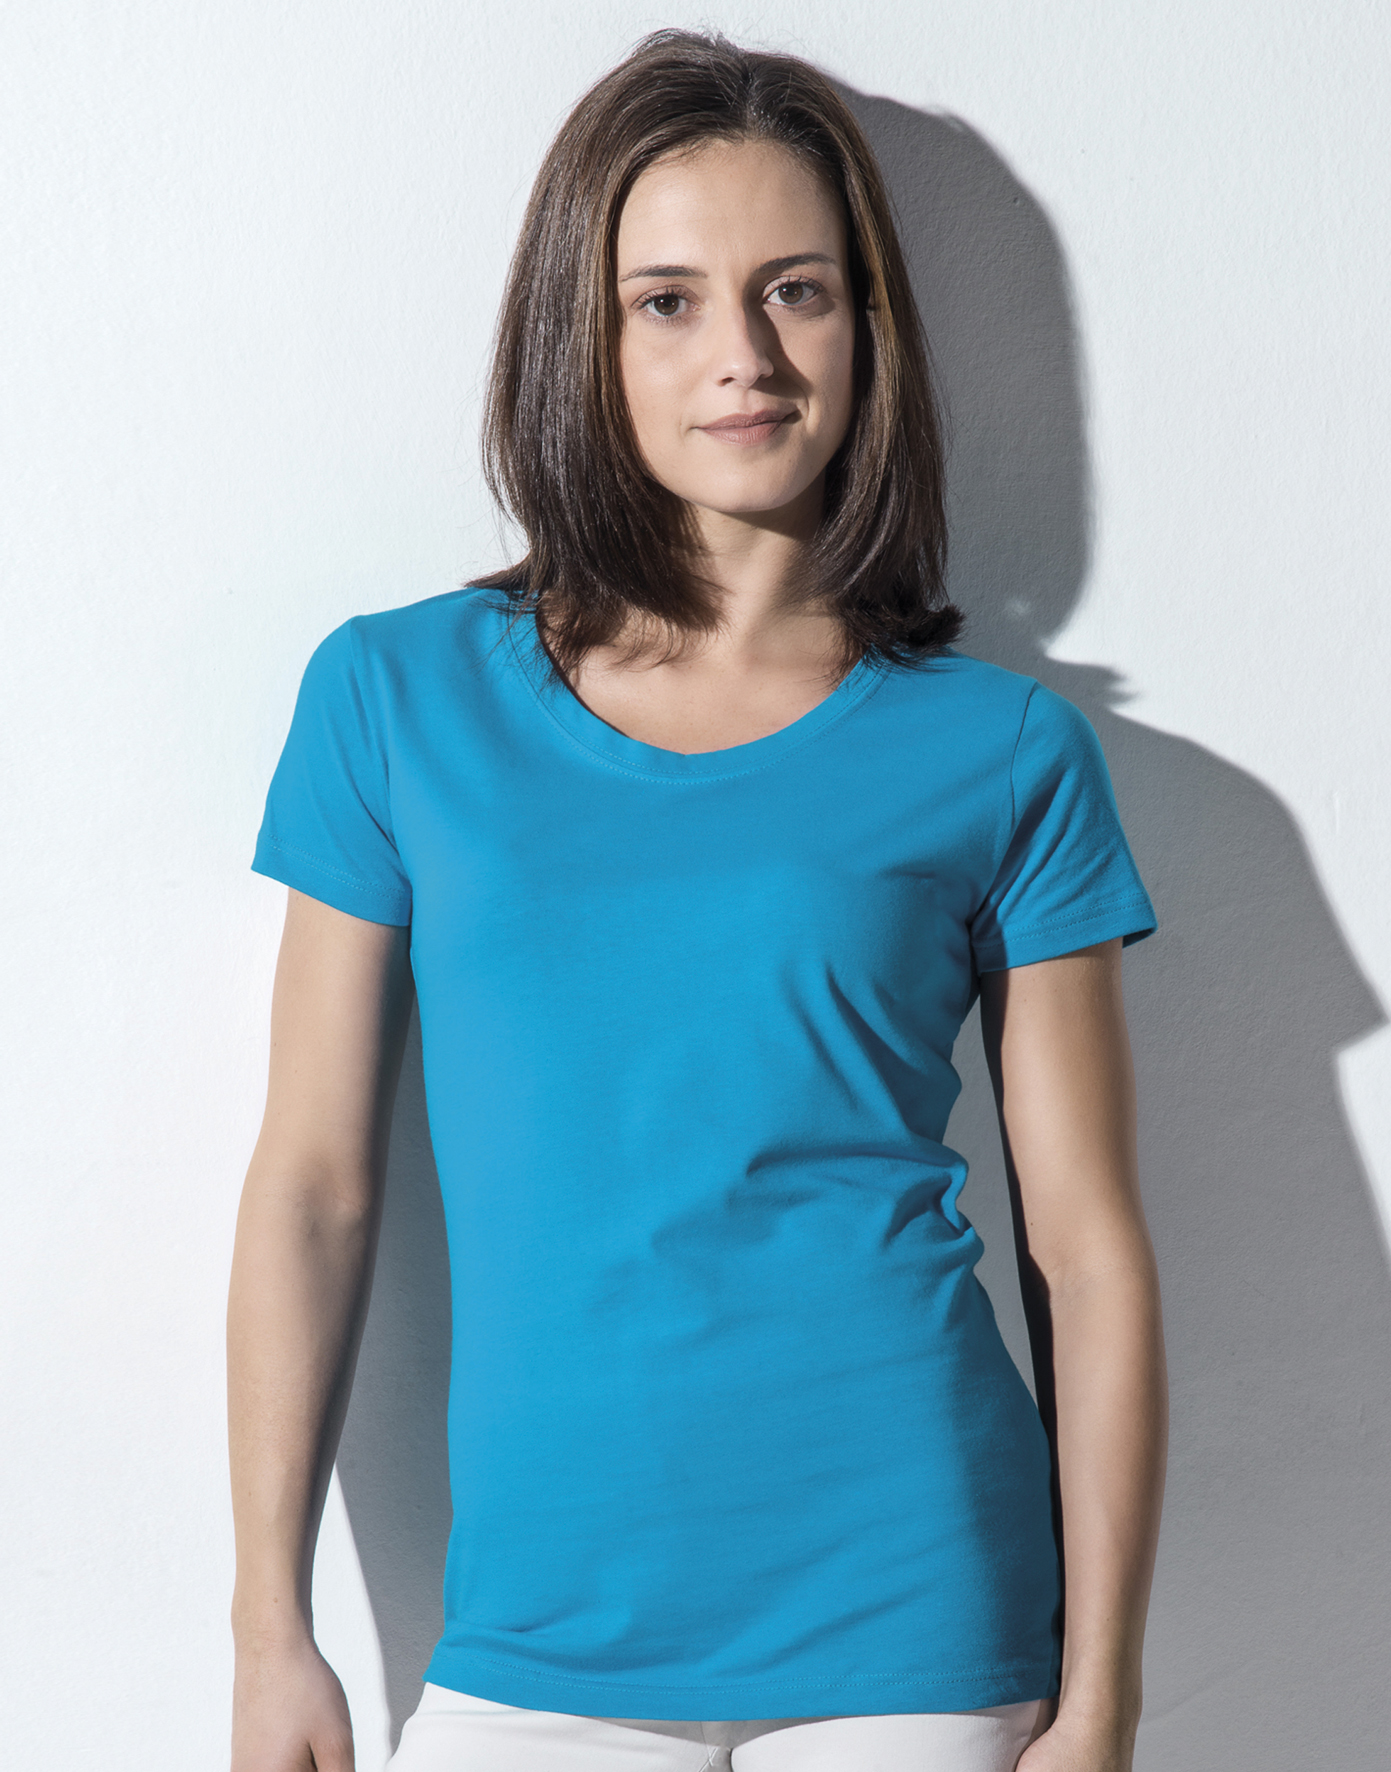 Nakedshirt susan women s scoop neck t shirt 502024 for Scoop neck t shirt